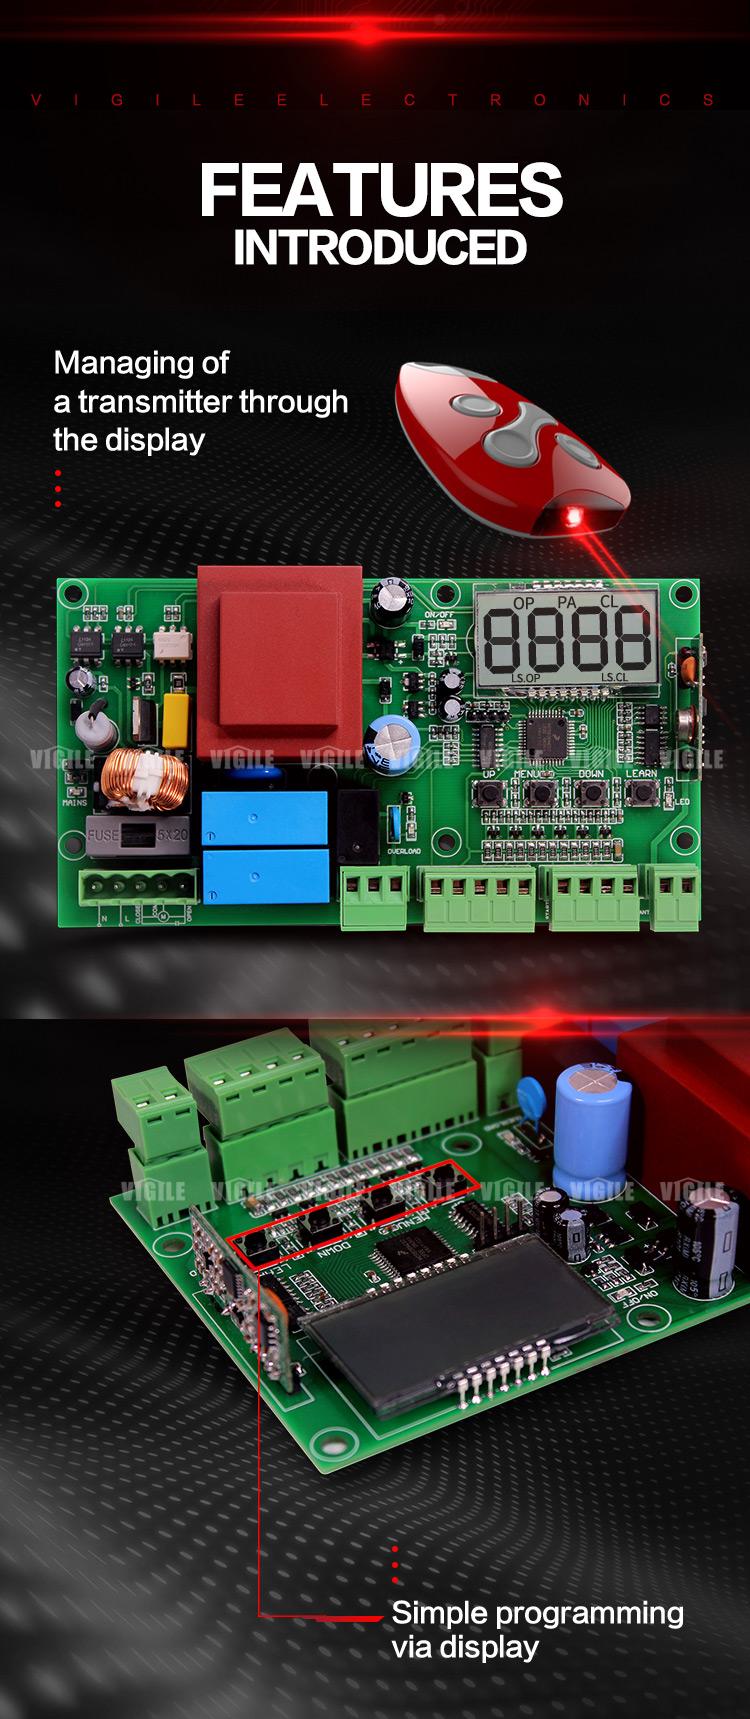 24v Automatic Swing Gate Opener Control Board Vigile Vg Drc 6 Controller Image Circuit Panel